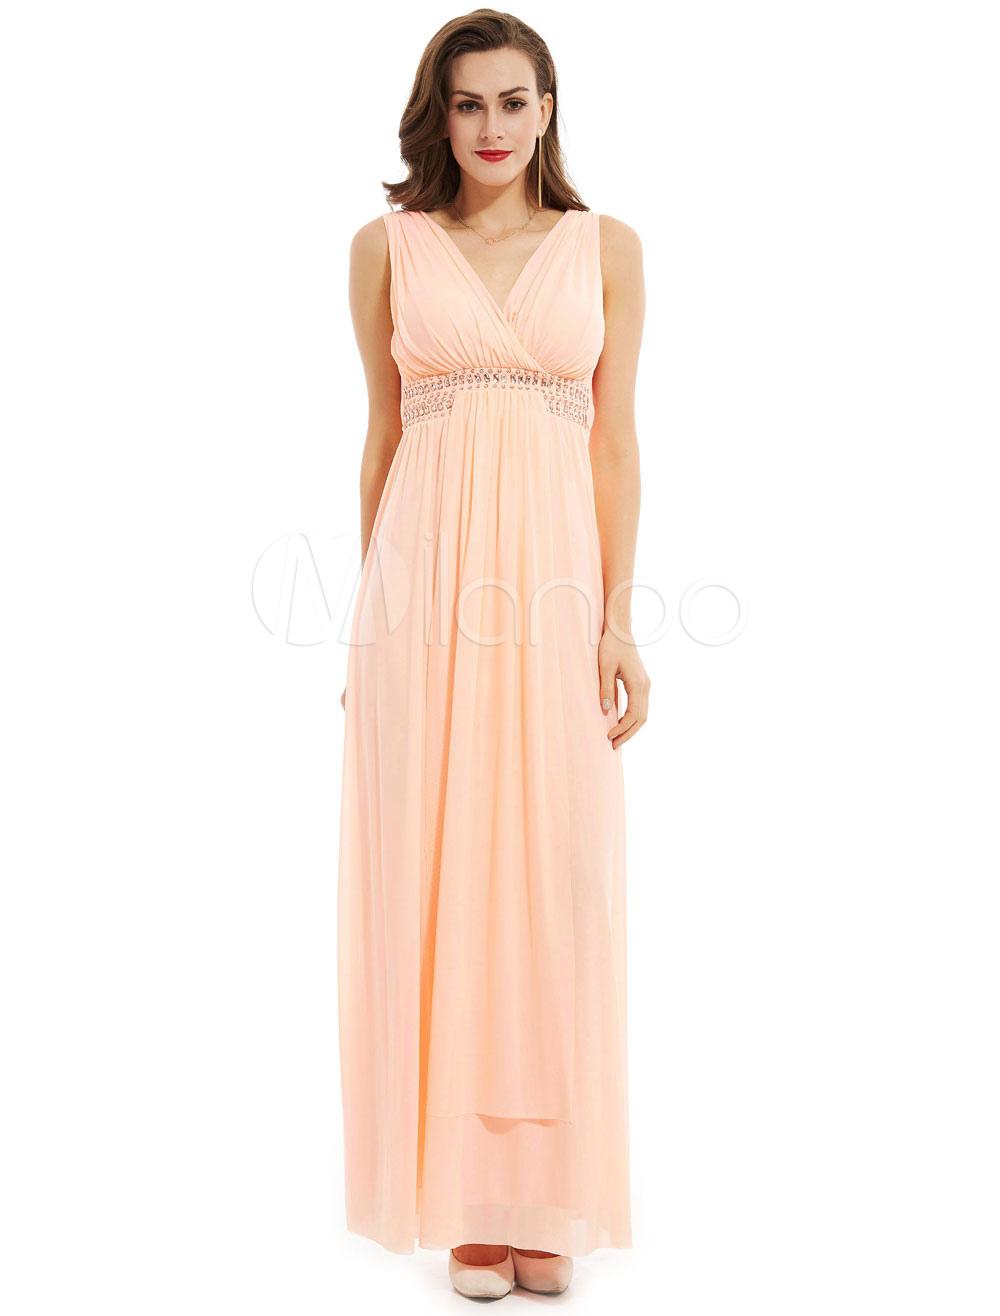 Long Prom Dresses V Neck Pleated Chiffon Peach Beading Waist Formal Party Dress (Wedding) photo